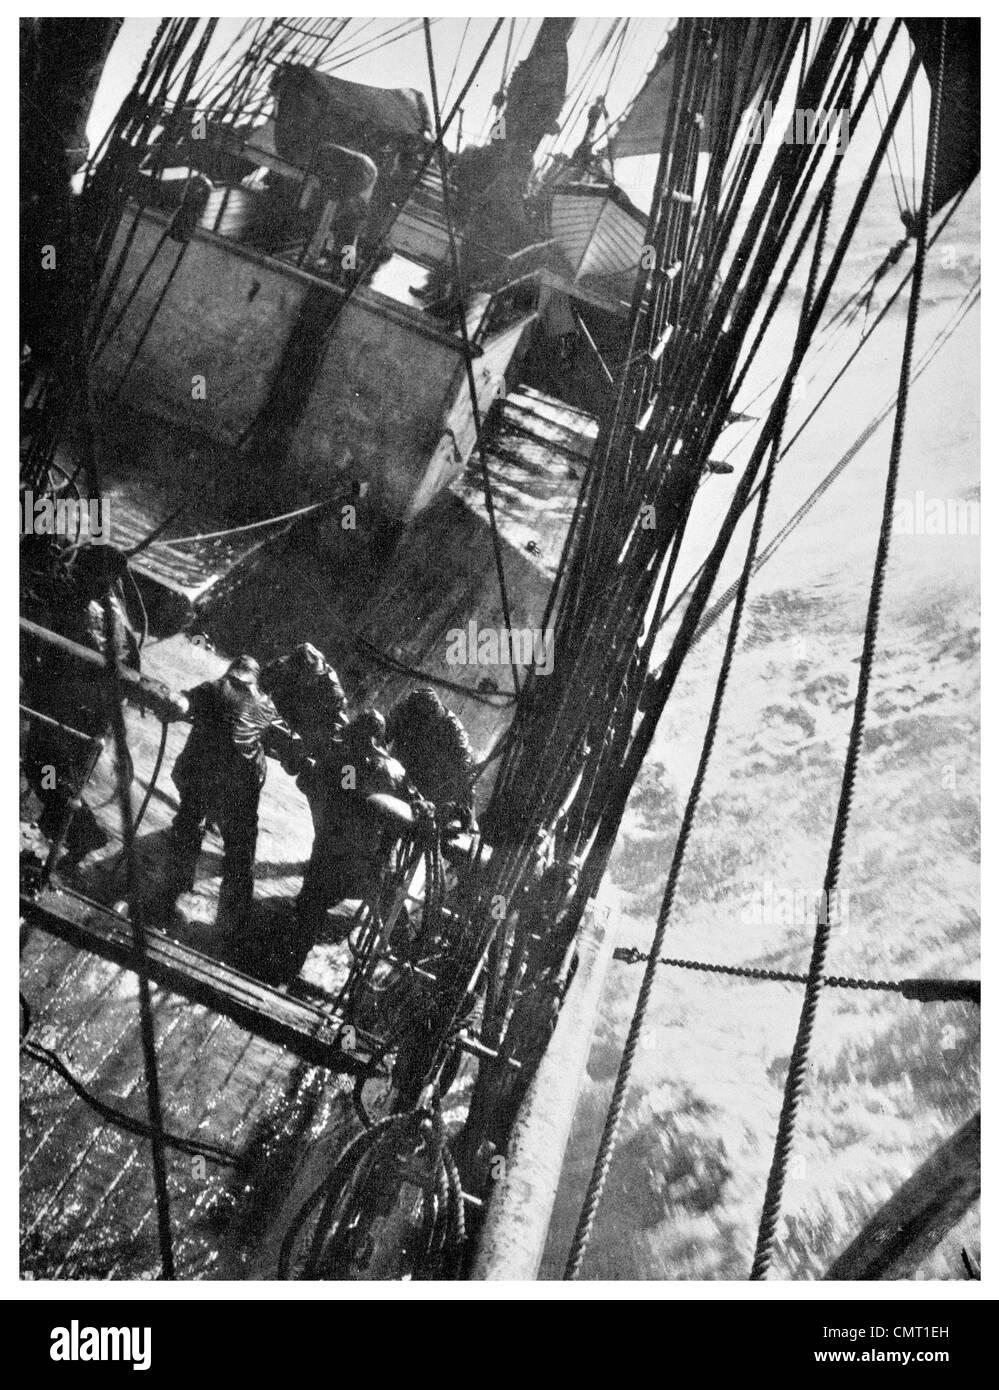 1912 Terra Nova Gale High seas  Antarctica British Antarctic Expedition - Stock Image